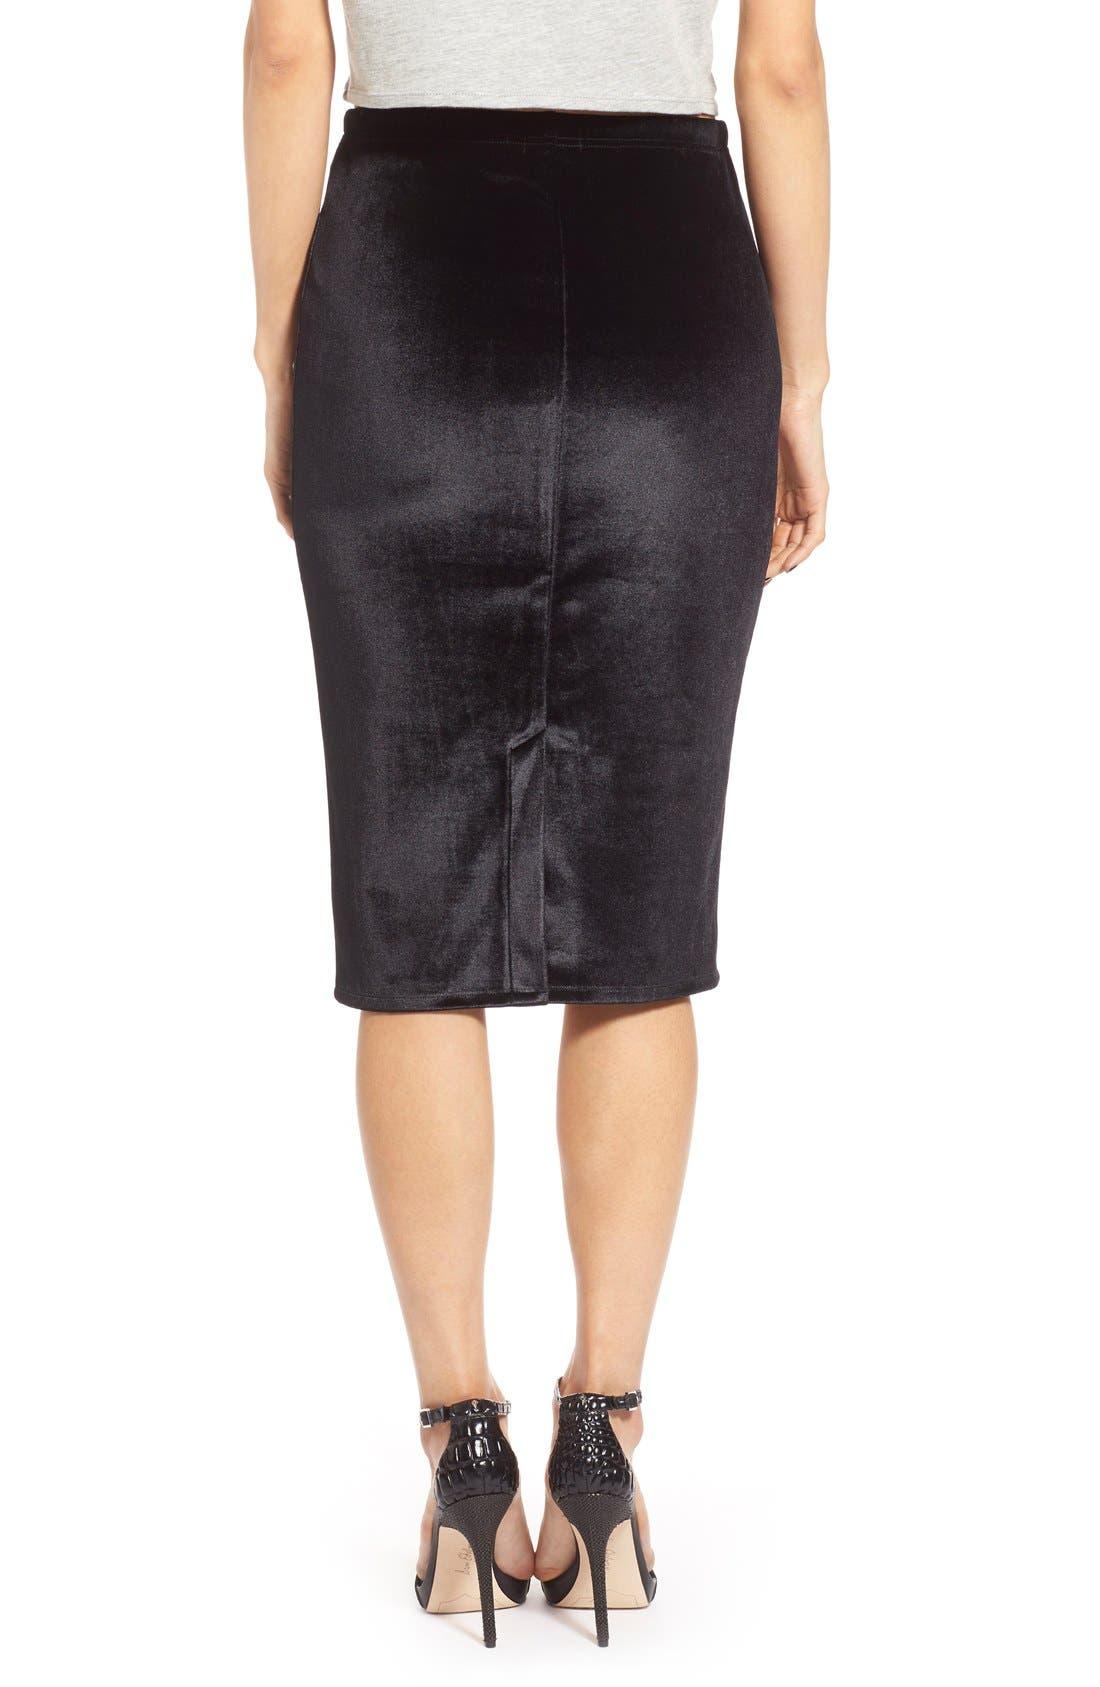 LEITH,                             Velour Pencil Skirt,                             Alternate thumbnail 5, color,                             001